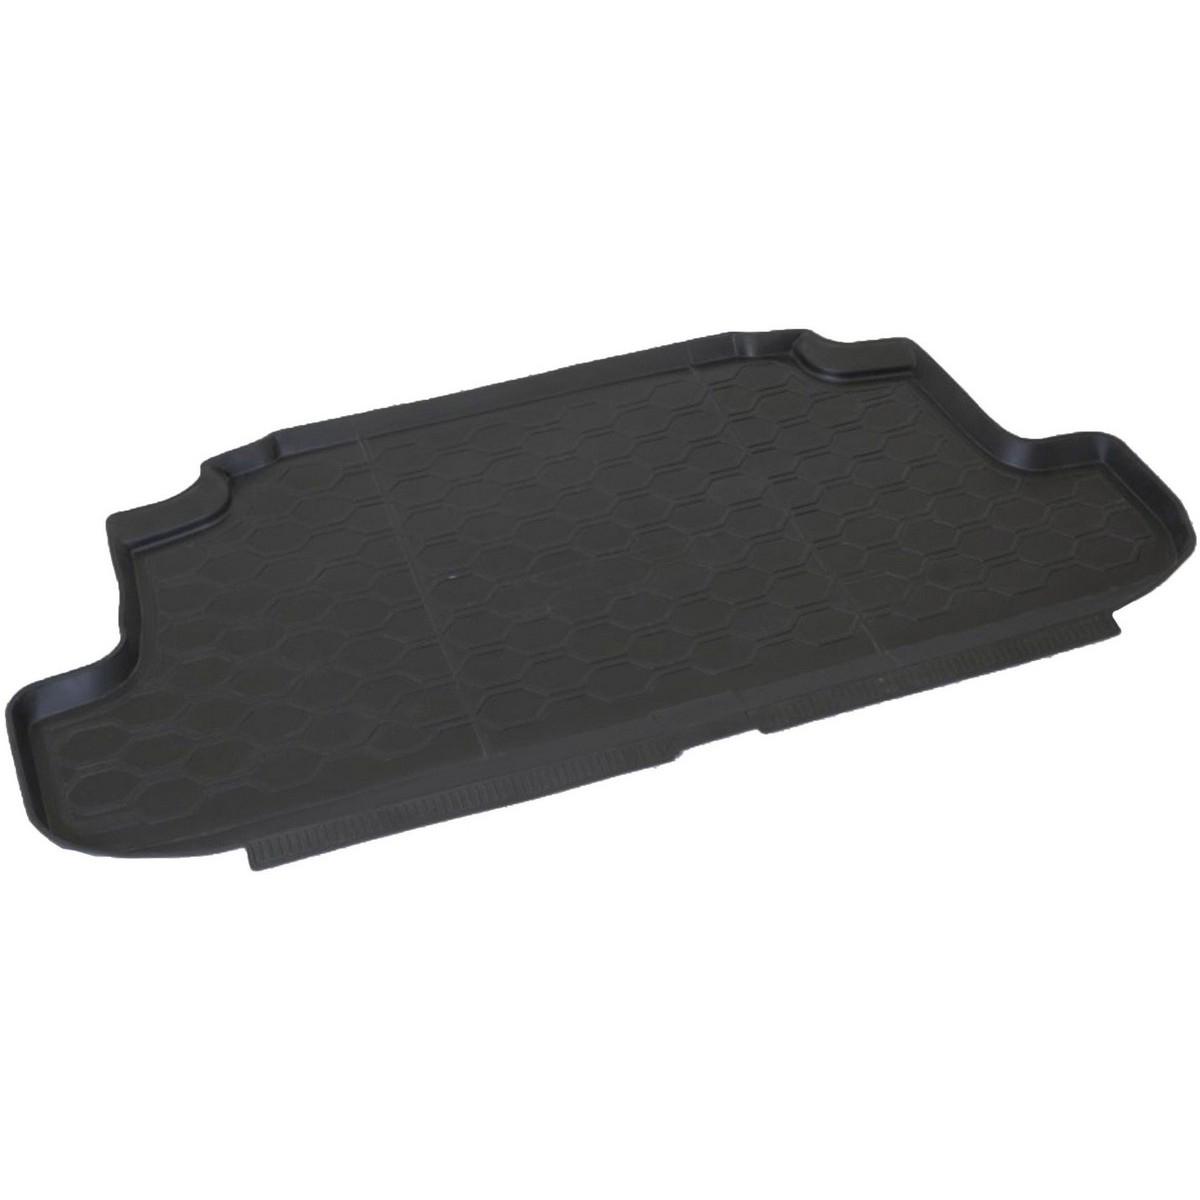 Купить Коврик багажника Rival для Lada 4x4 3-дв. 2009-, полиуретан, 1 шт. 16005001